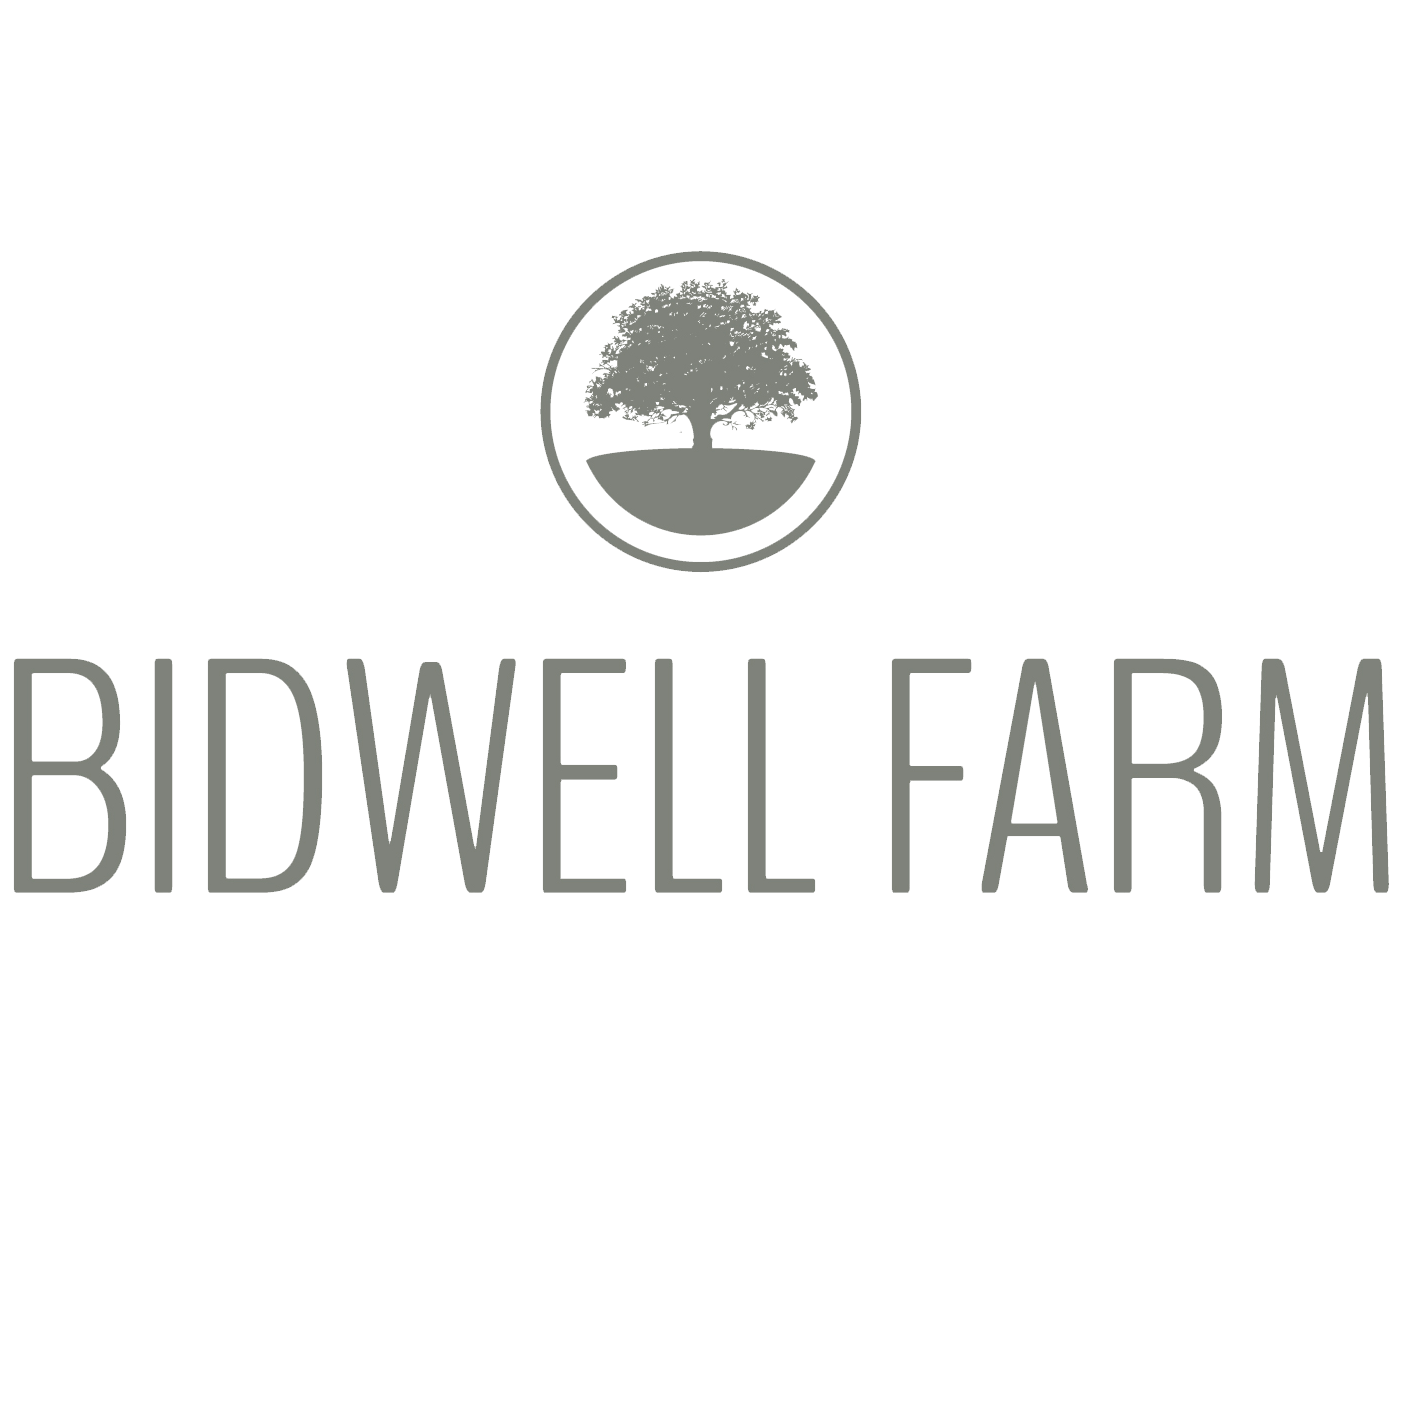 (c) Bidwellfarm.co.uk